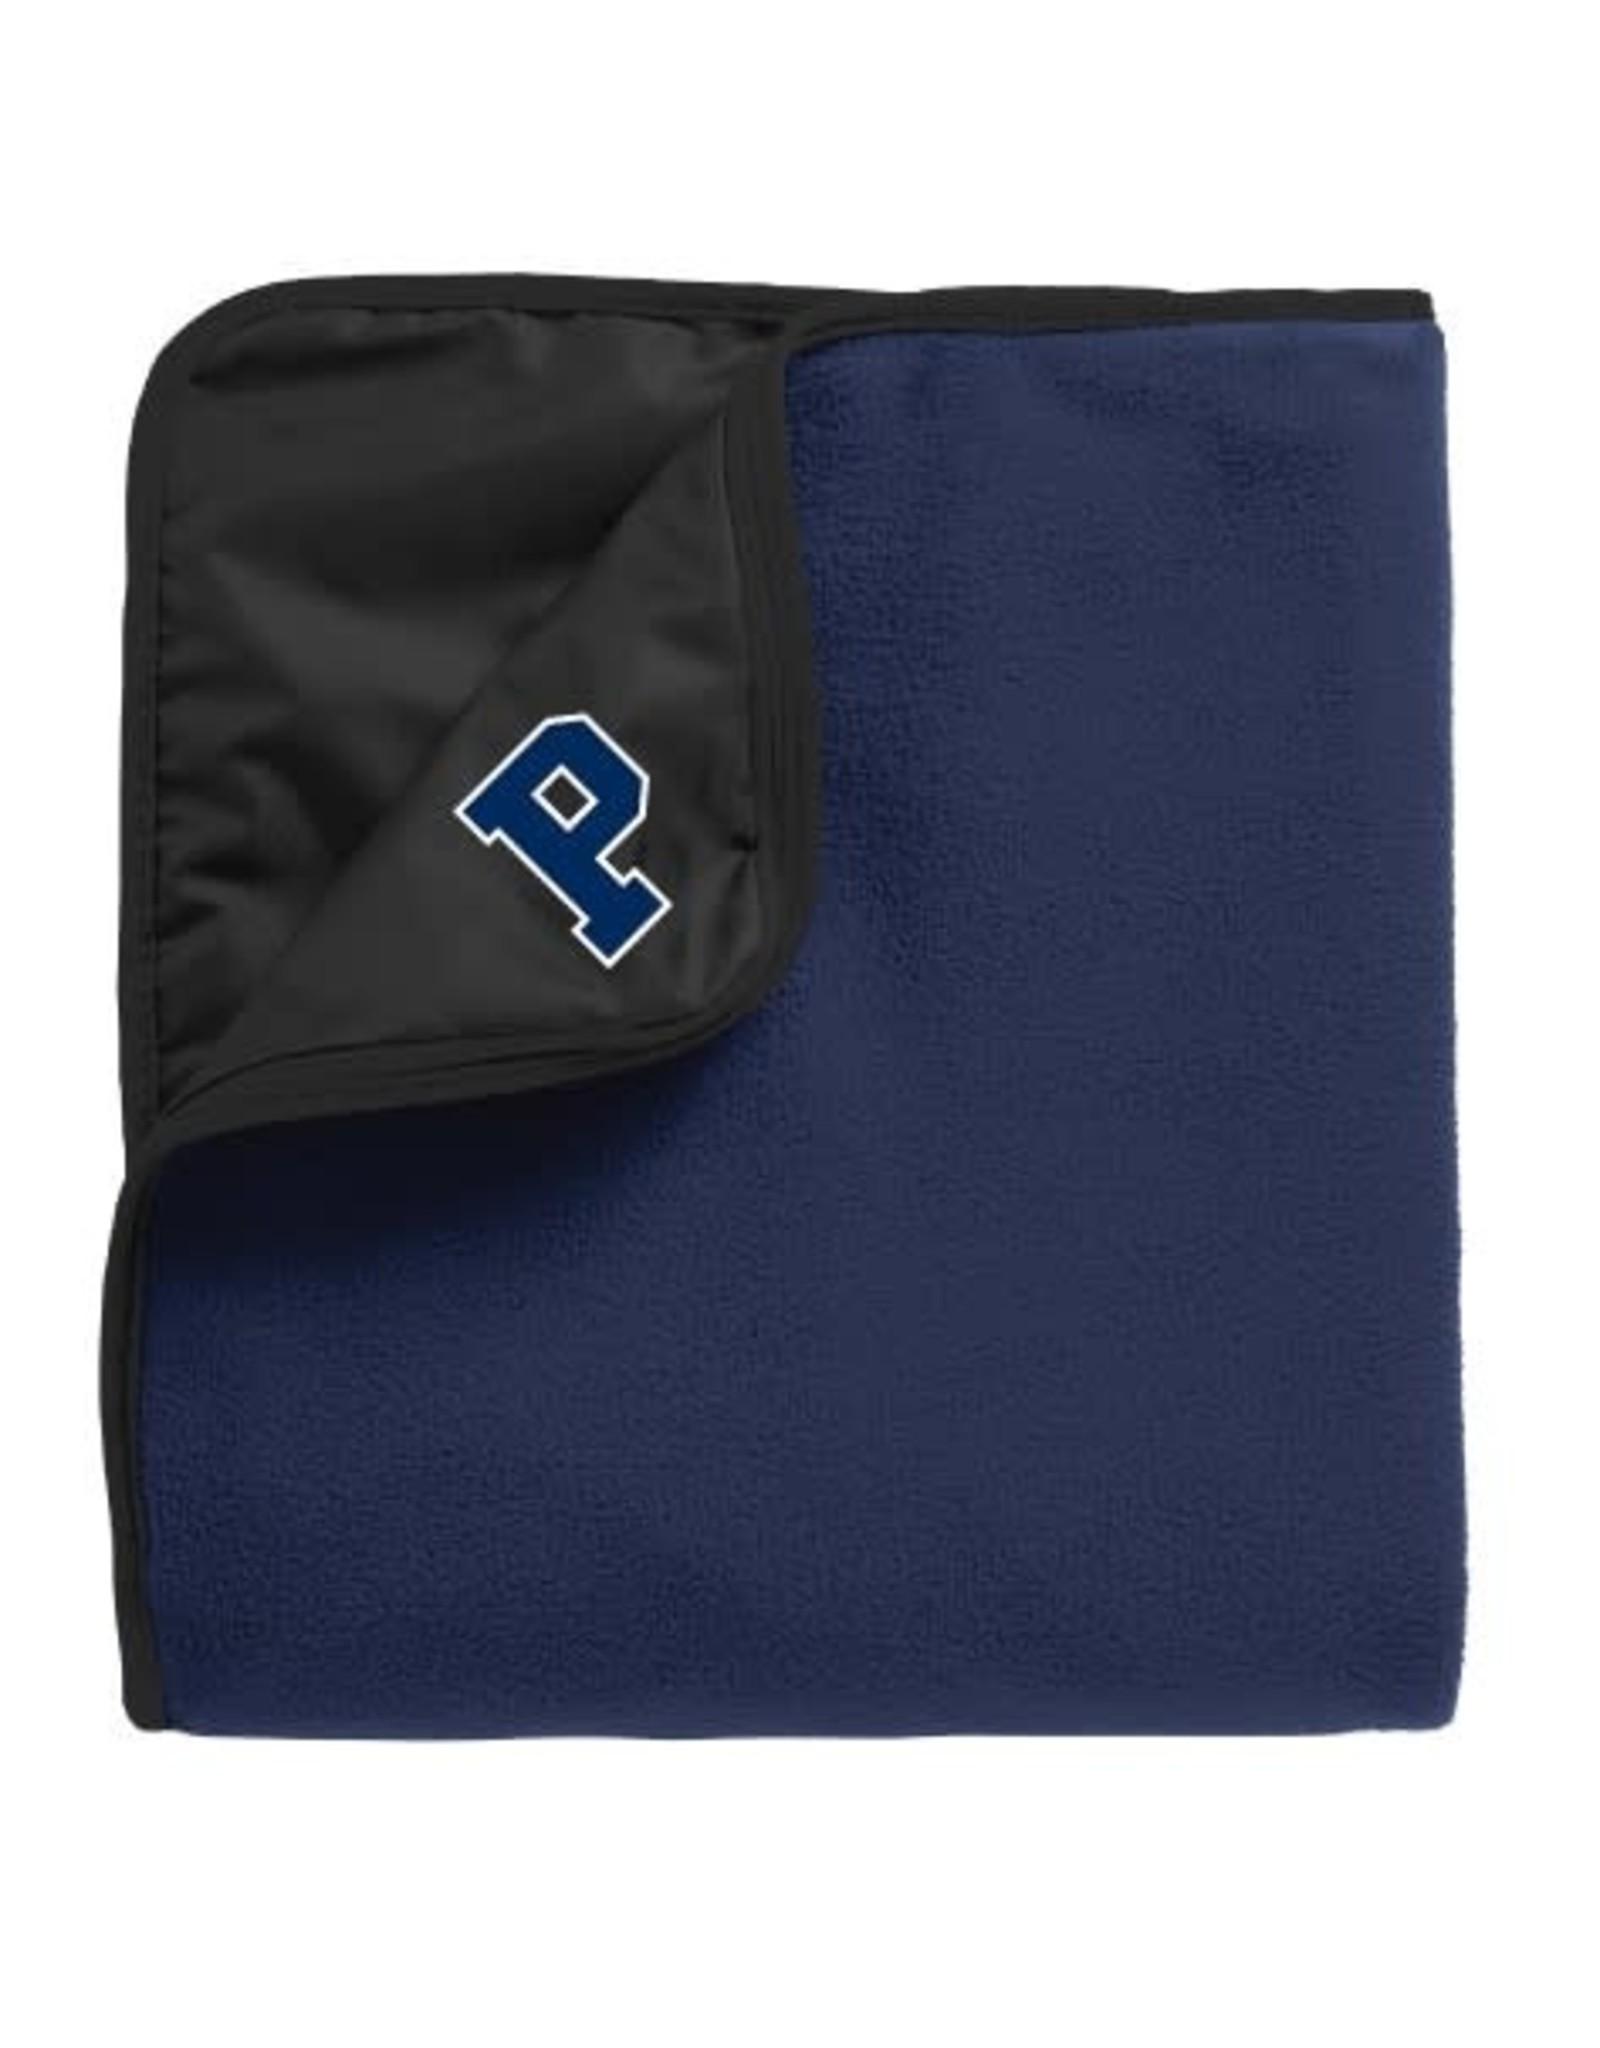 Fleece Picnic Blanket-Blue/Black-50 x 60